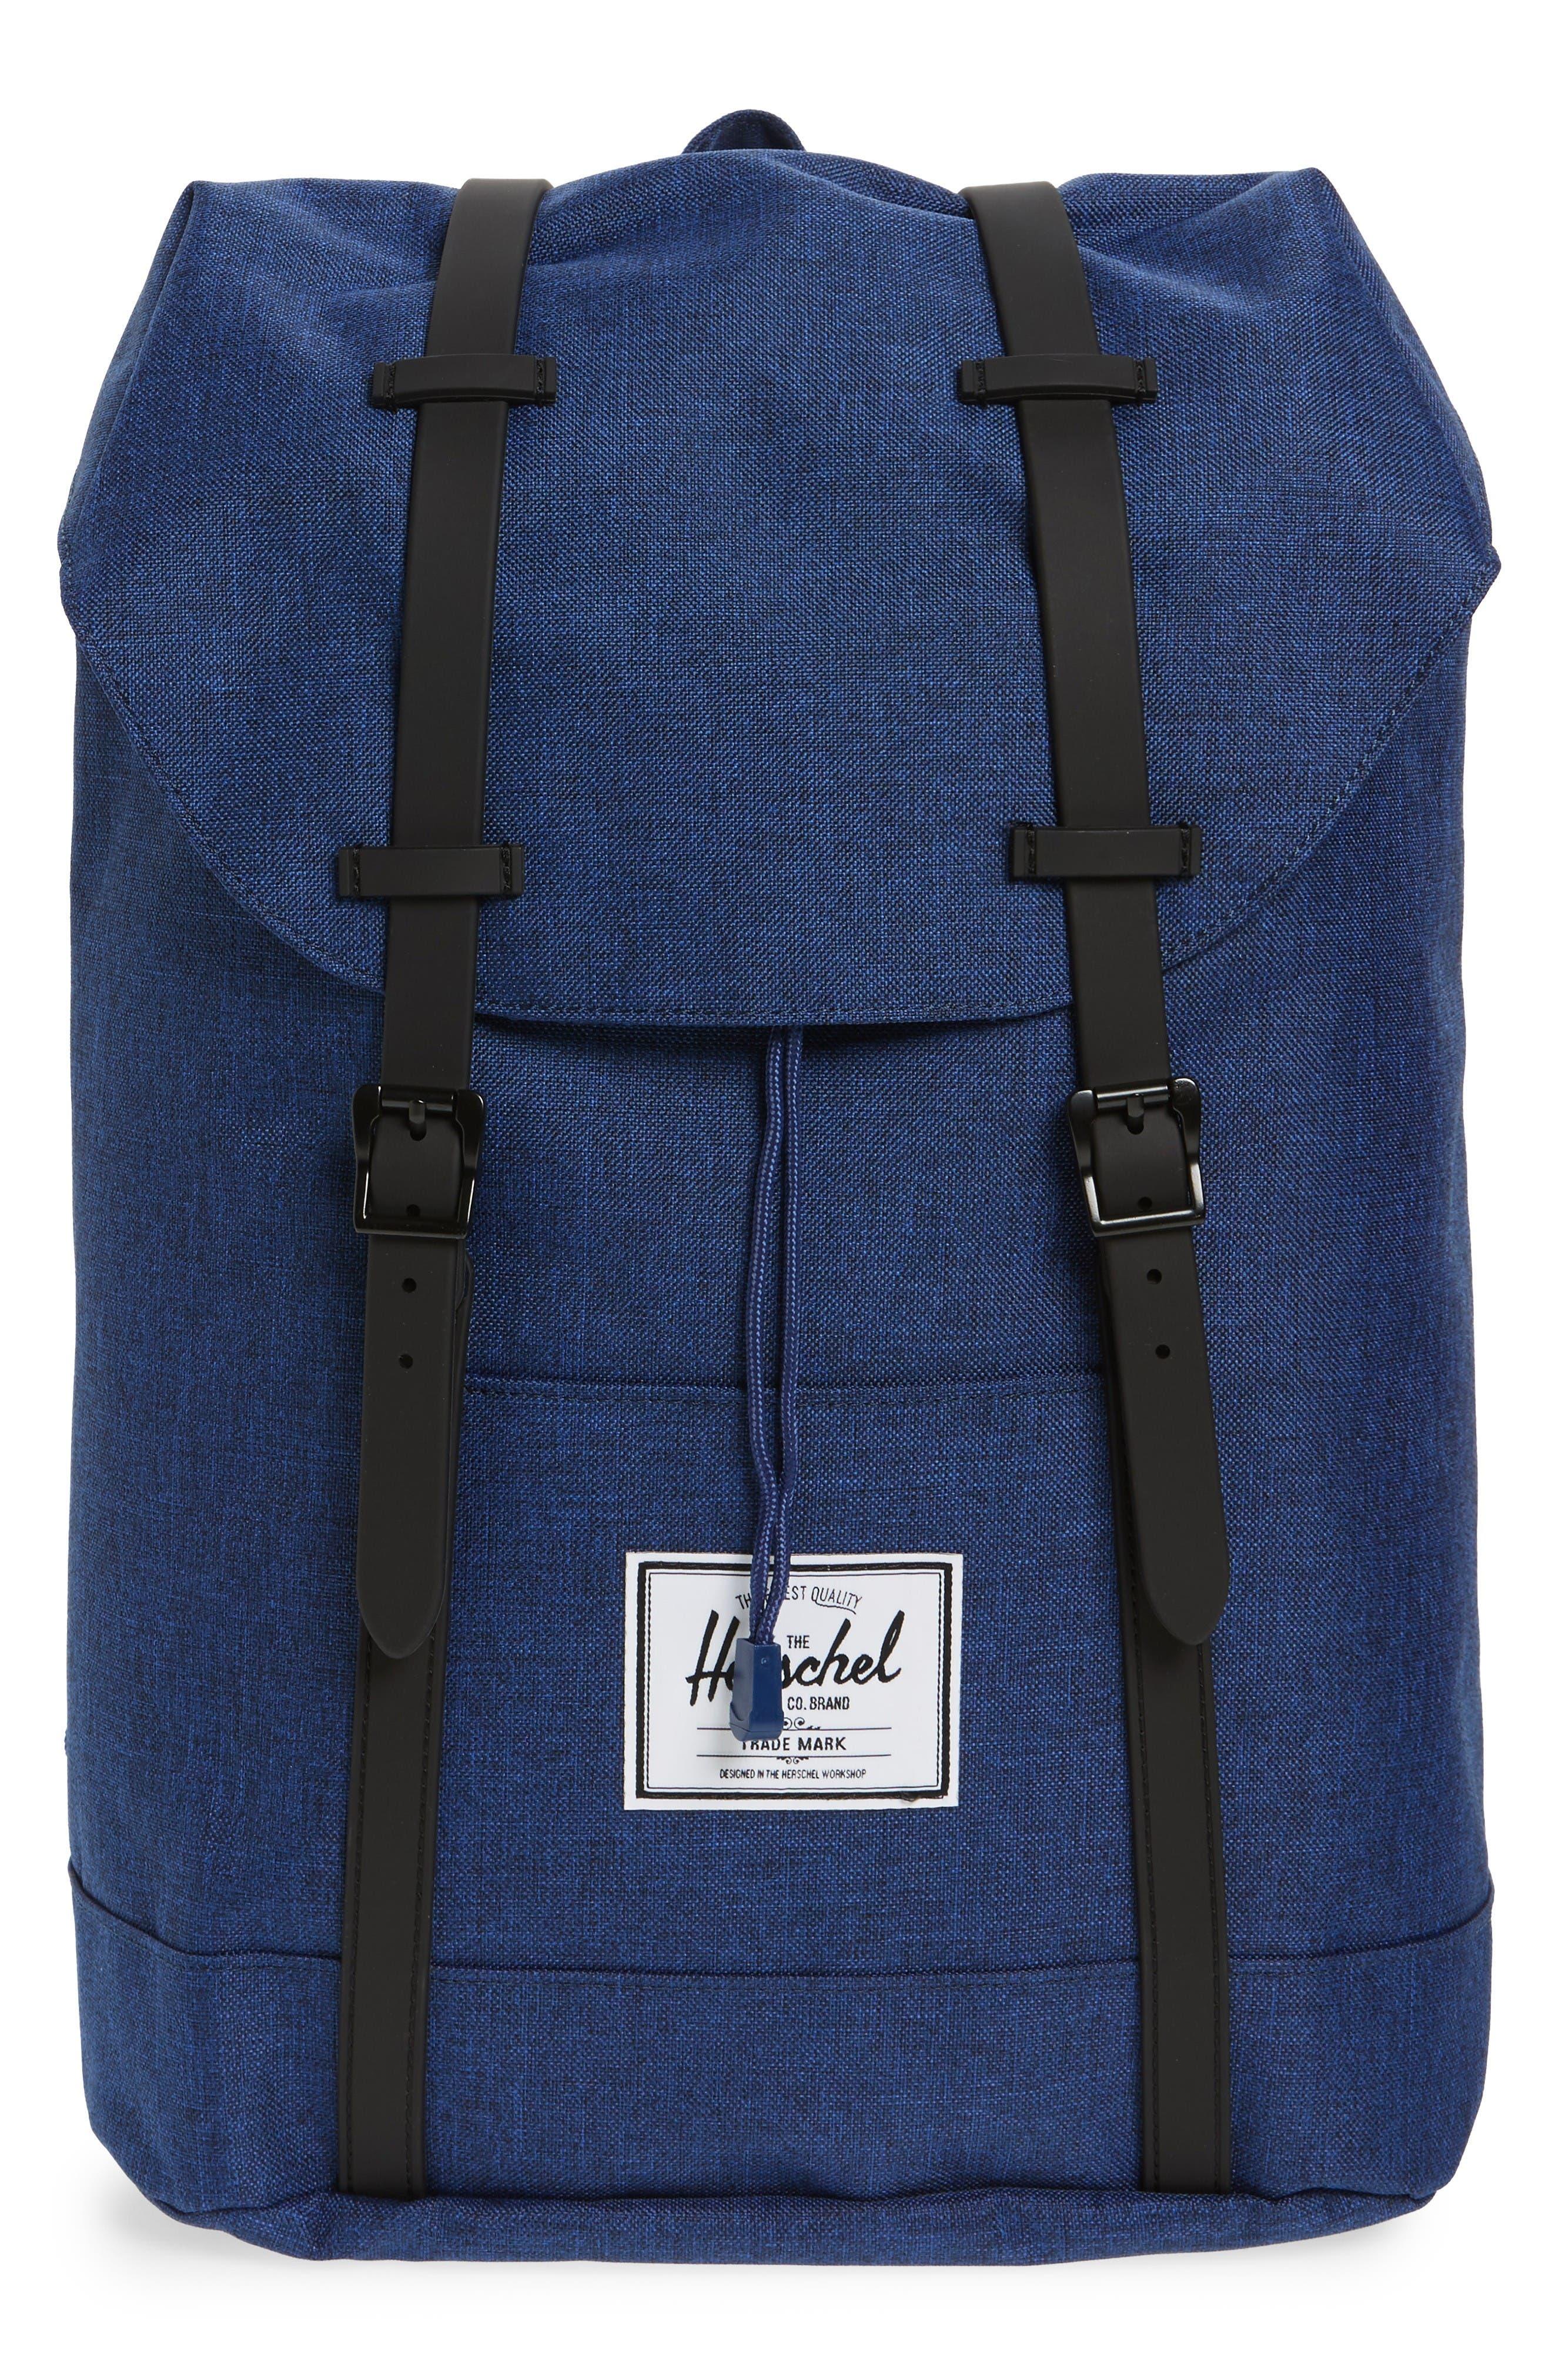 Alternate Image 1 Selected - Herschel Supply Co. Retreat Backpack